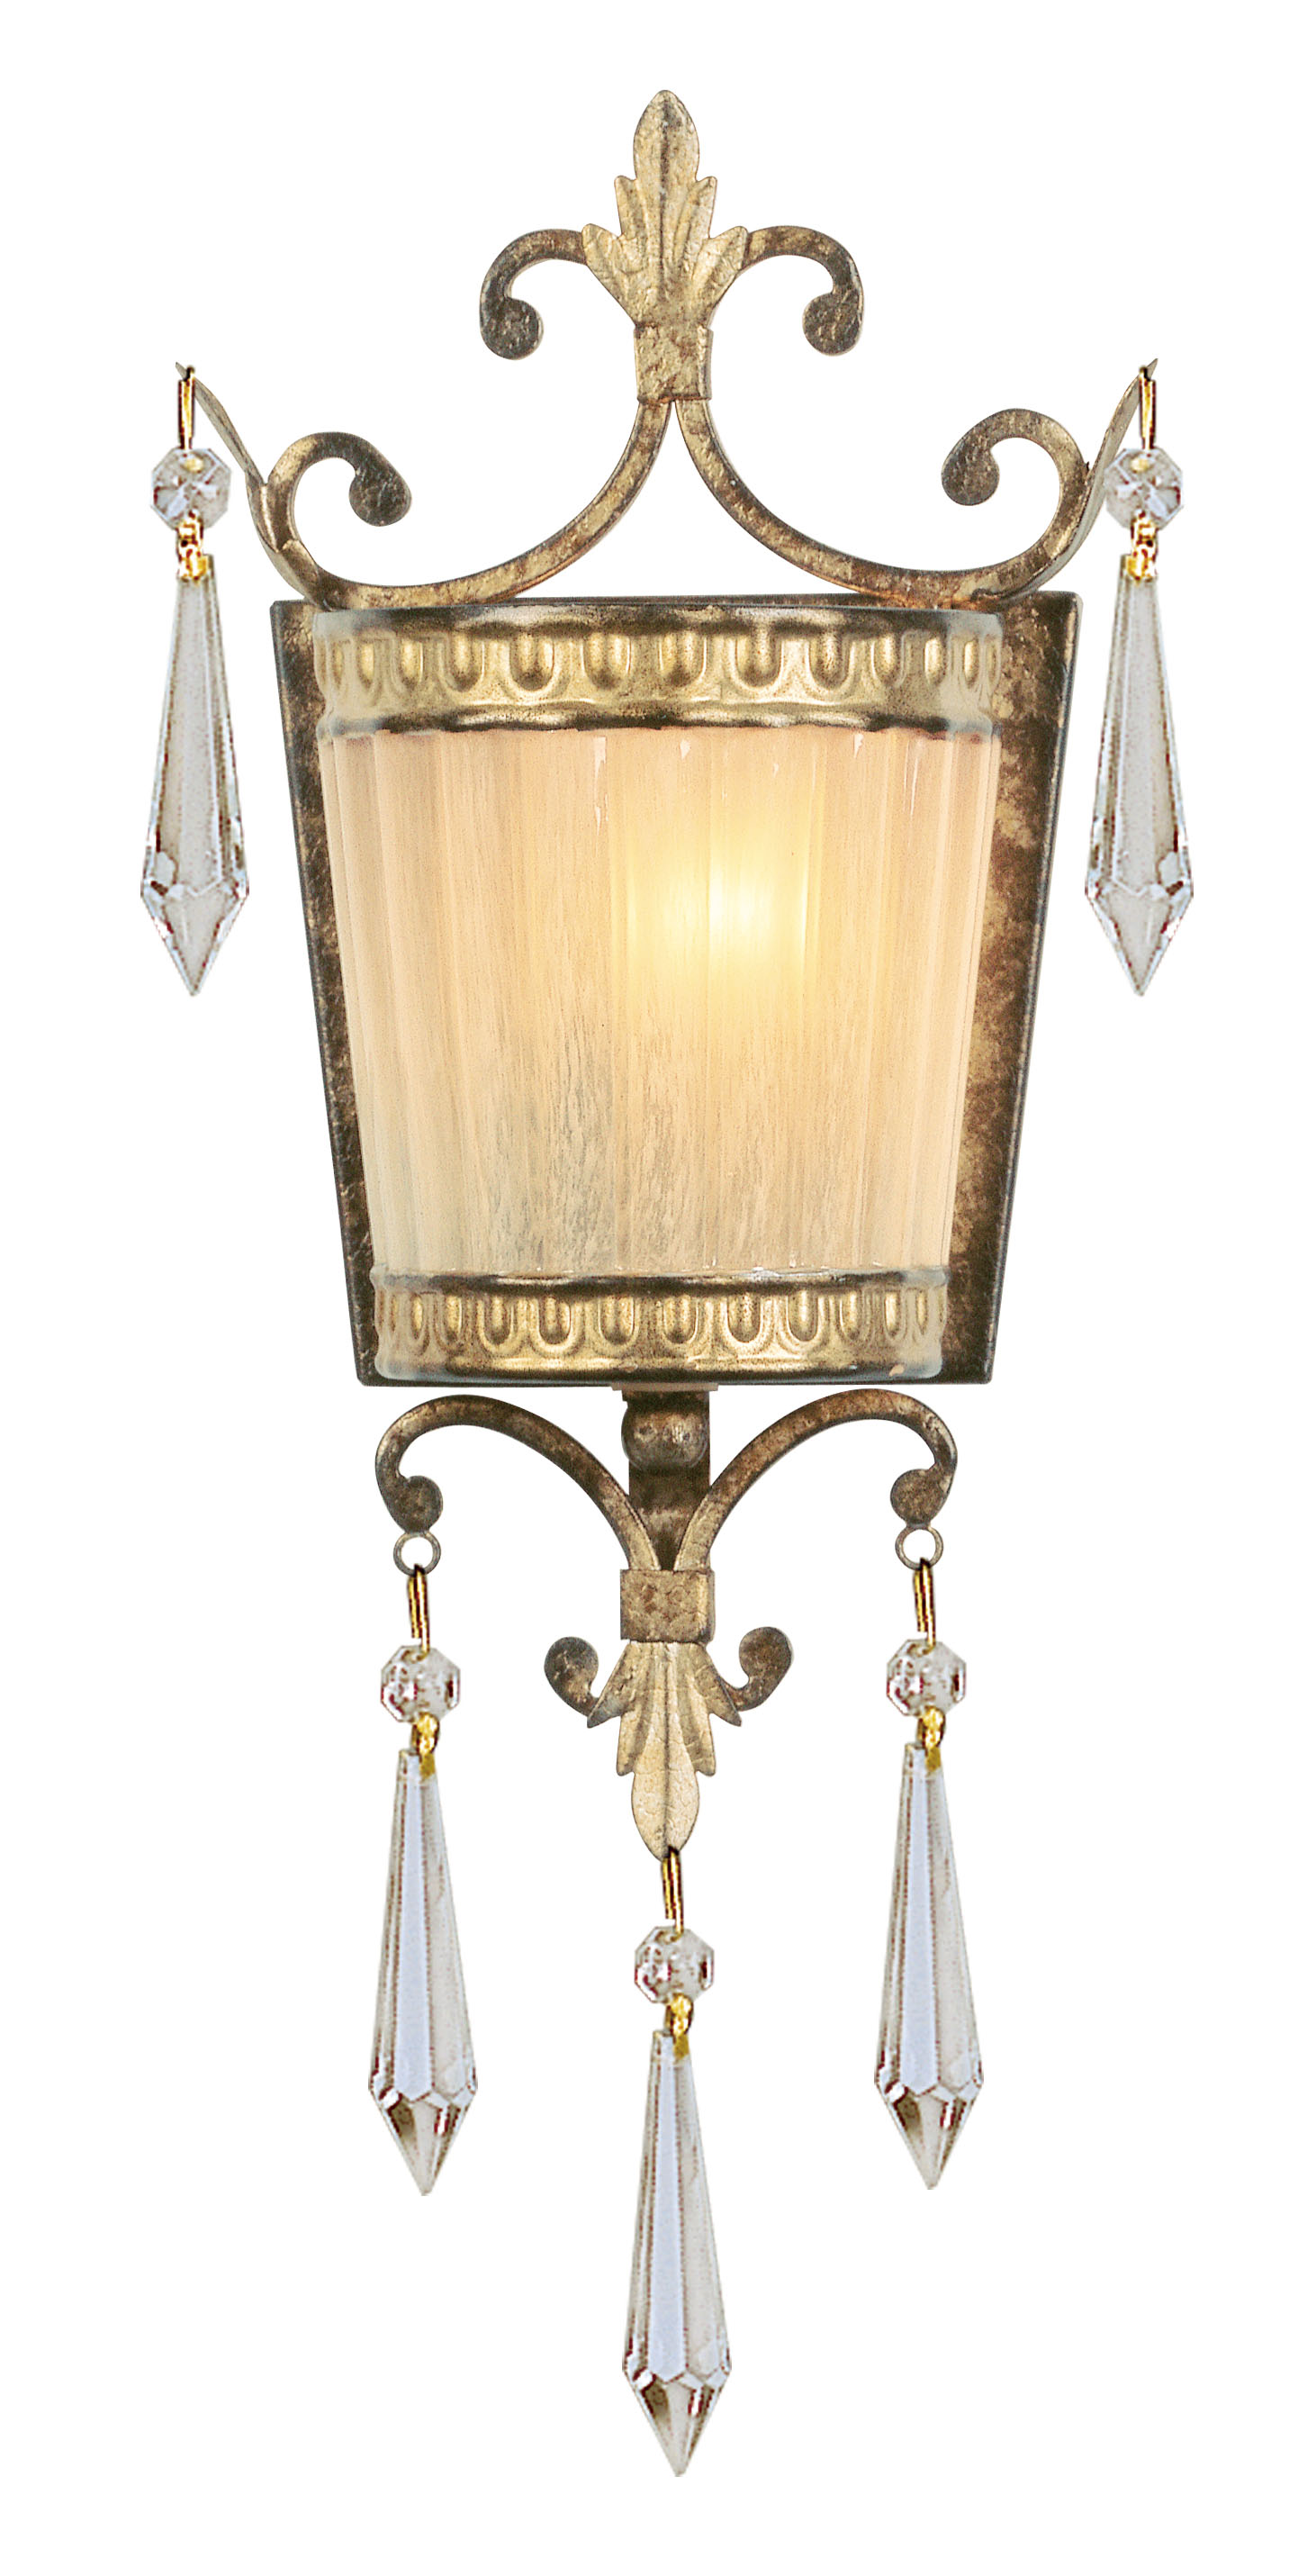 Livex Lighting La Bella Wall Sconce Hand Painted Vintage Gold Leaf 8880-65